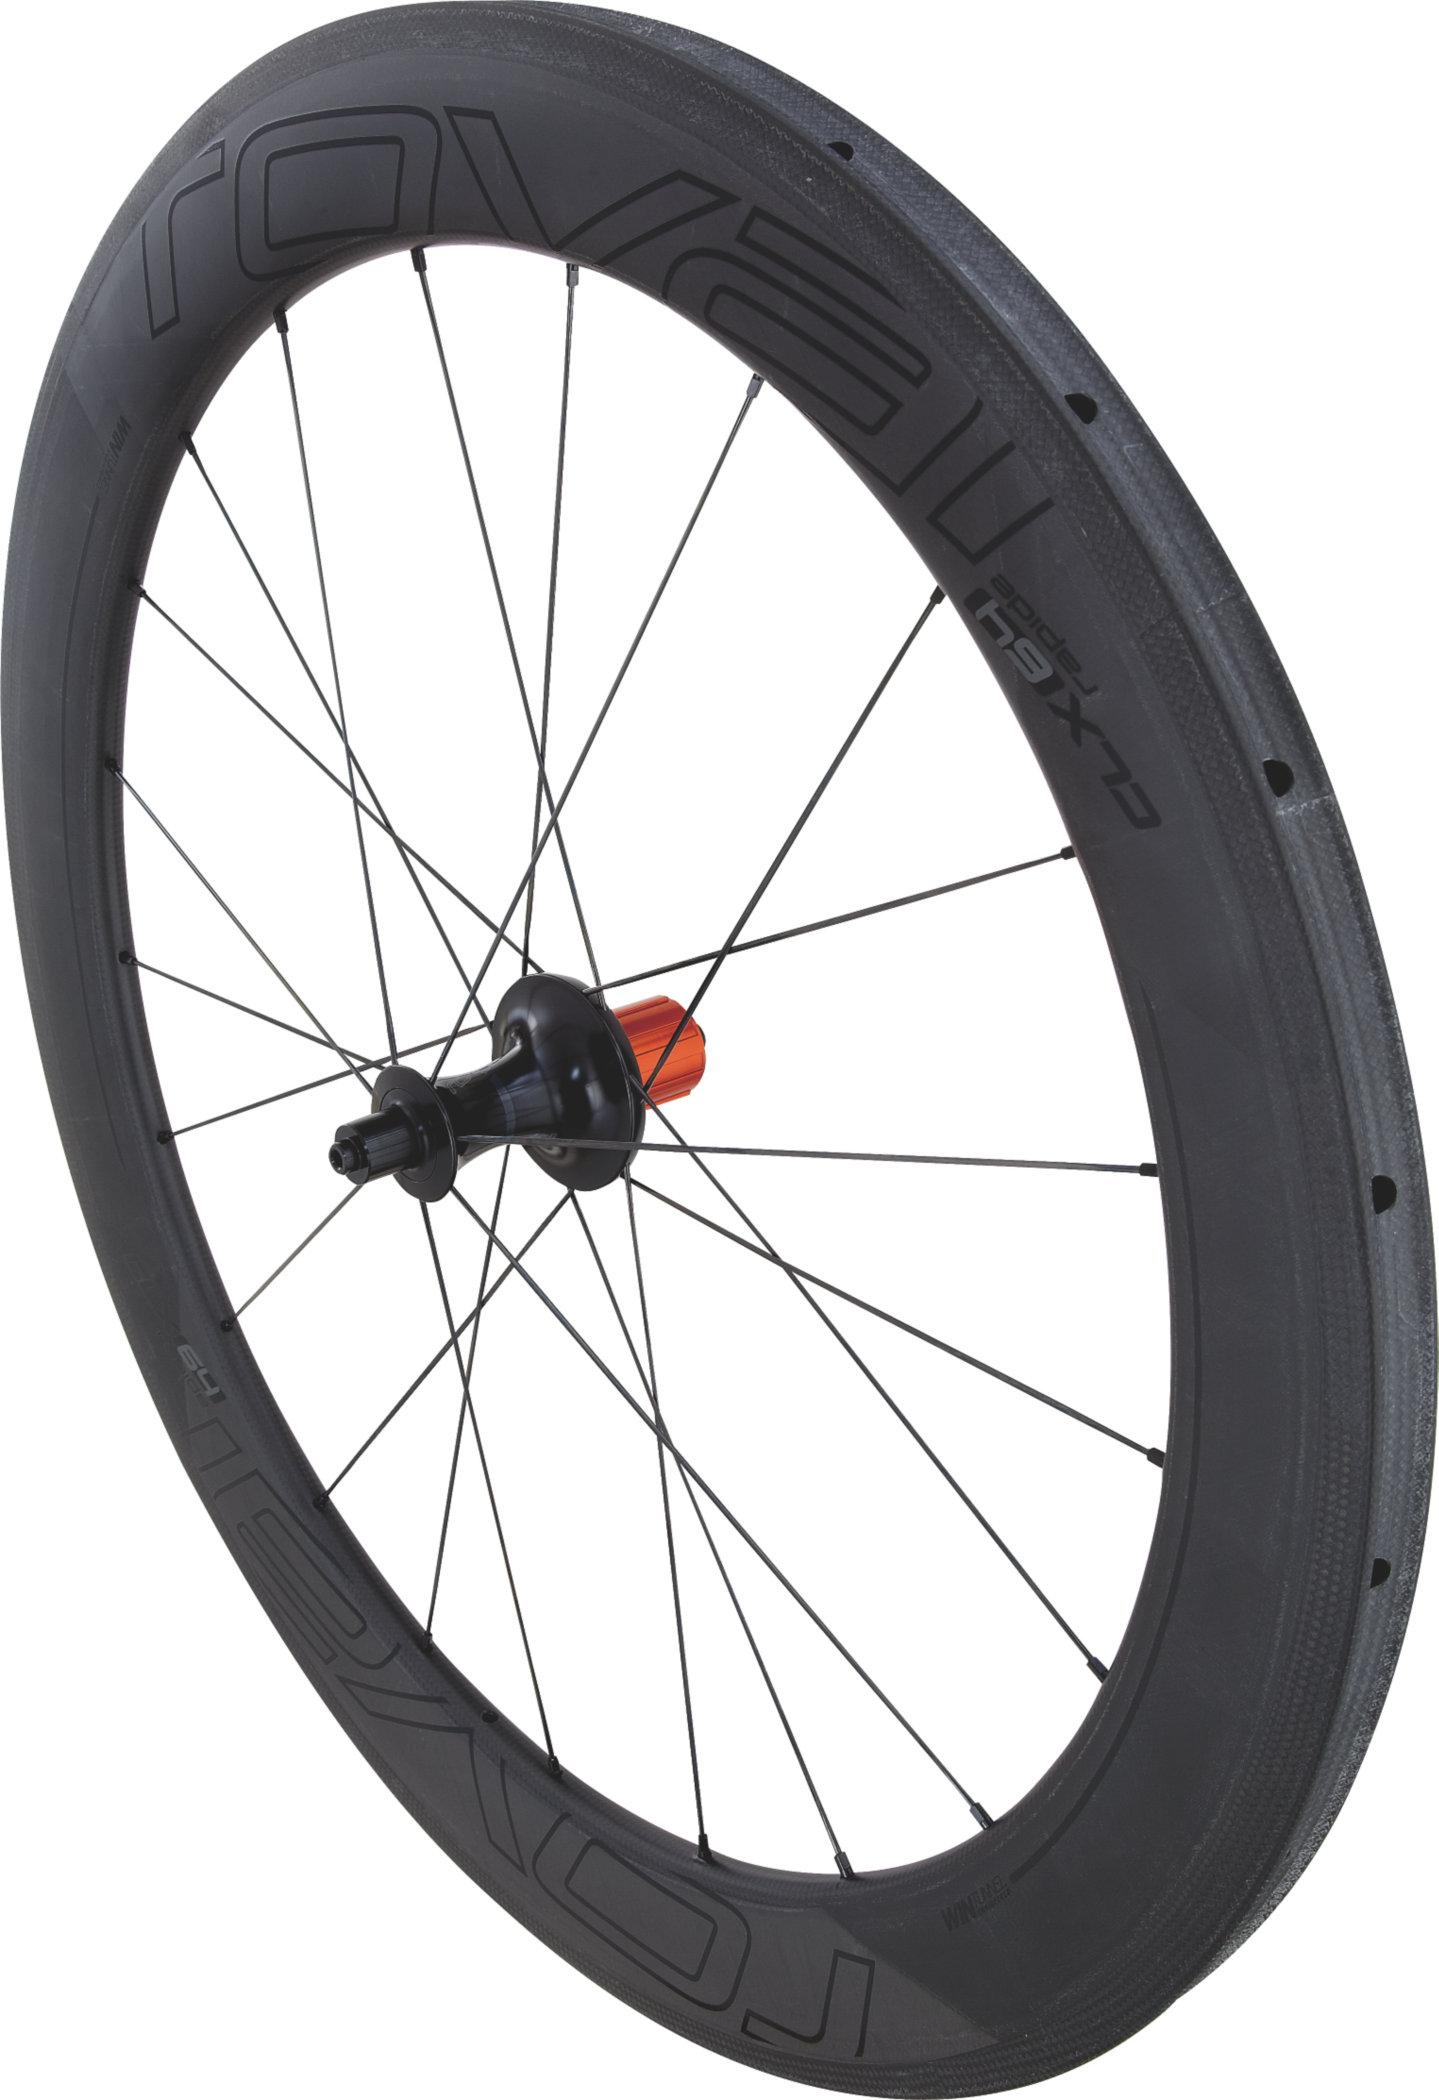 Specialized Roval CLX 64 – Tubular Rear Satin Carbon/Gloss Black 700c - Alpha Bikes